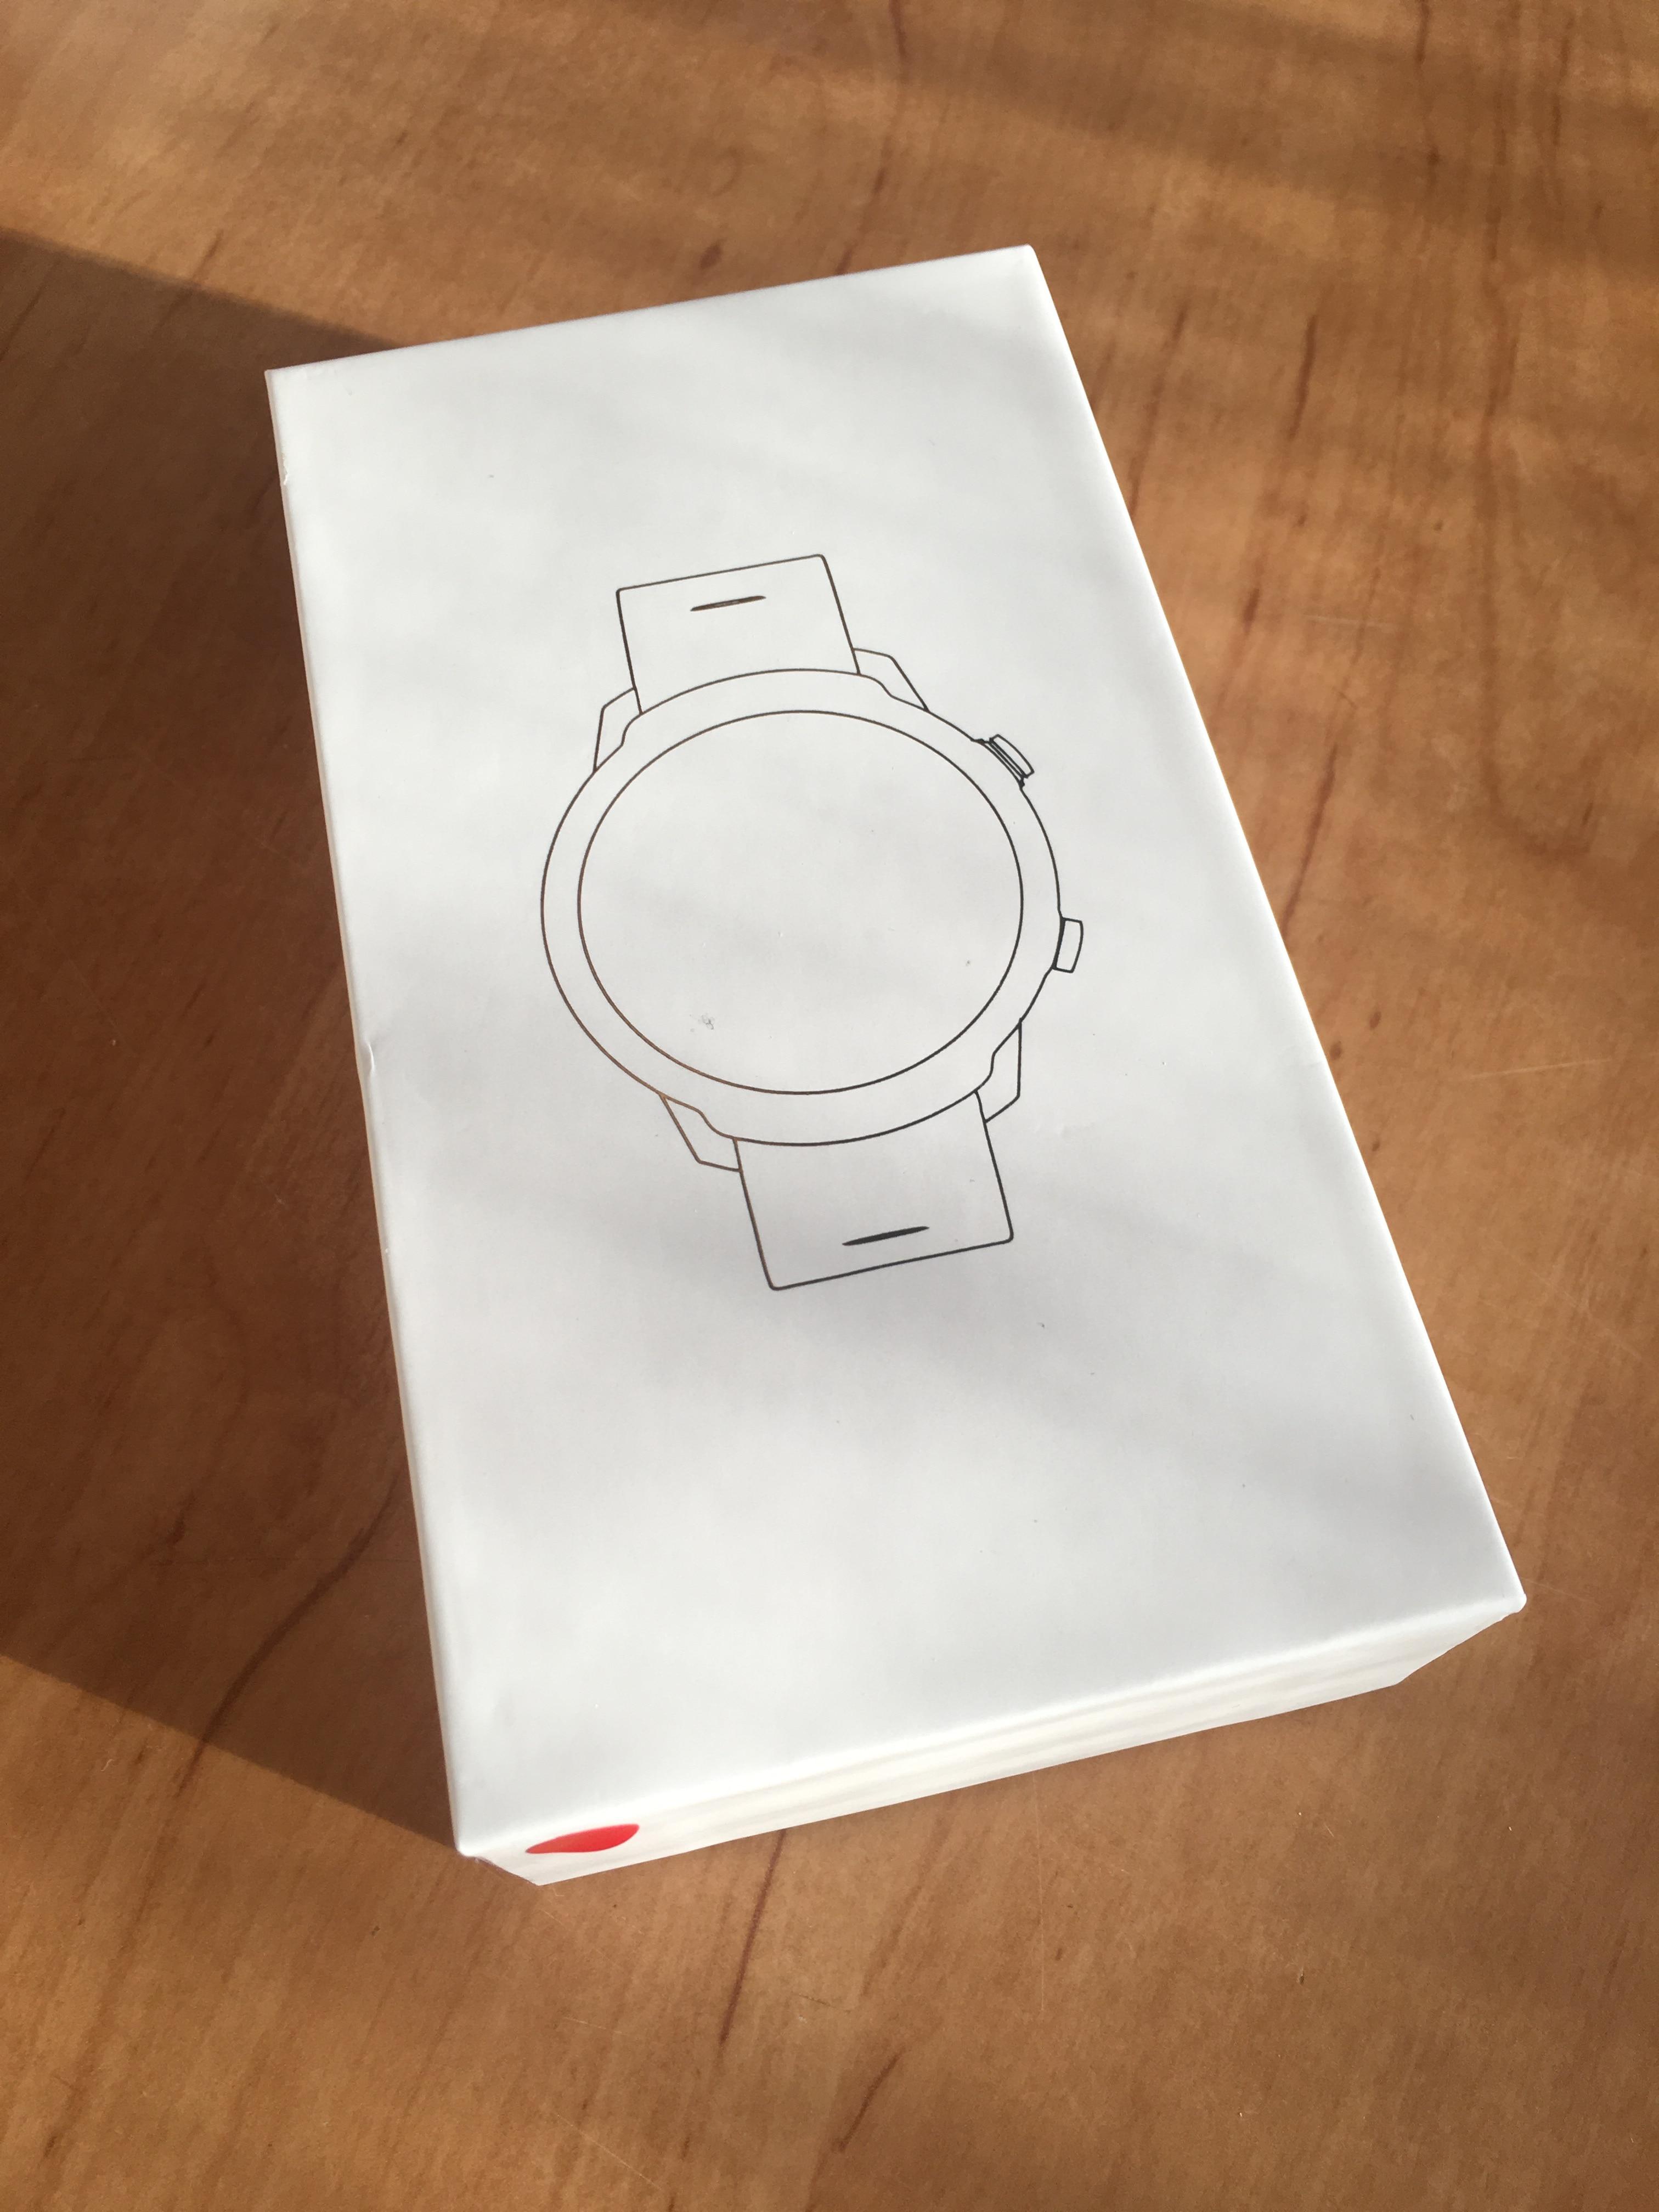 ESEED L5 Pro S10 Plus smart watch men IP67 waterproof full touch screen 60days long standby smartwatch Heart Rate PK honor watch|Smart Watches| |  - AliExpress